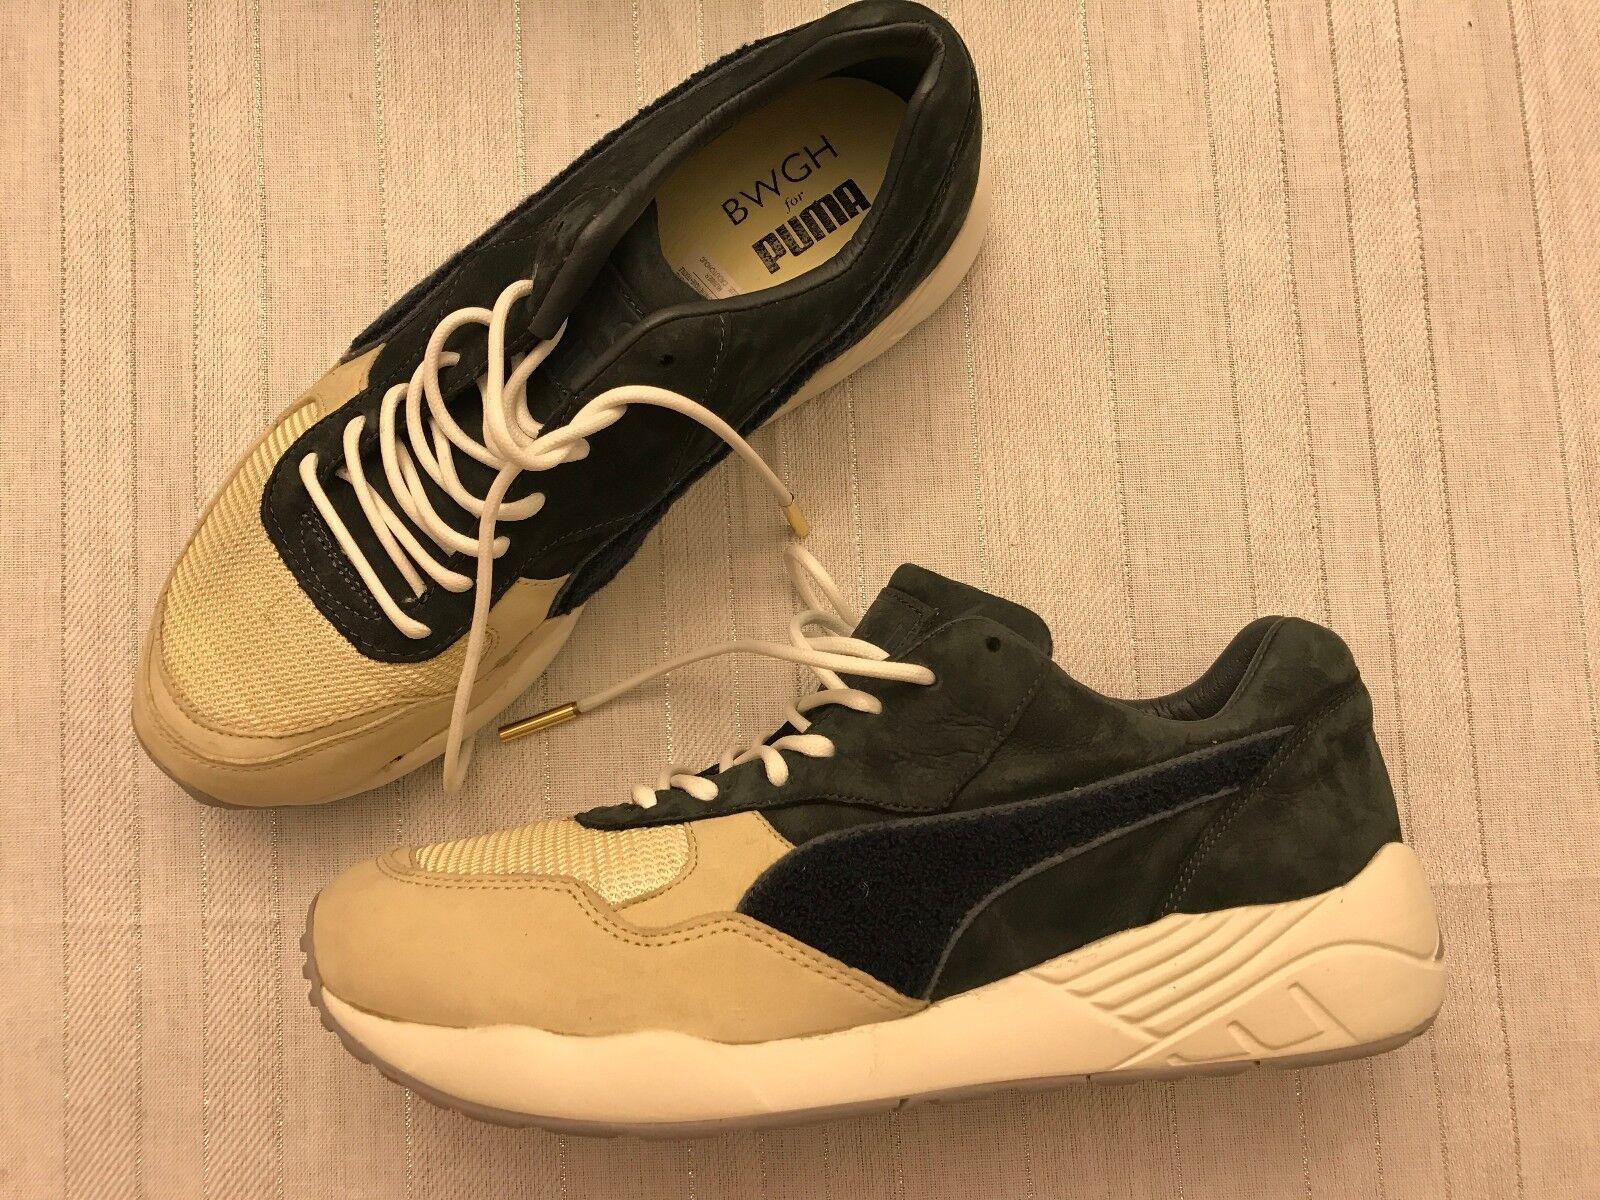 PUMA x BWGH TRINOMIC by PUMA - Slate - PUMA Dark Shadow - Sneakers size 9 extra laces ! bc8181